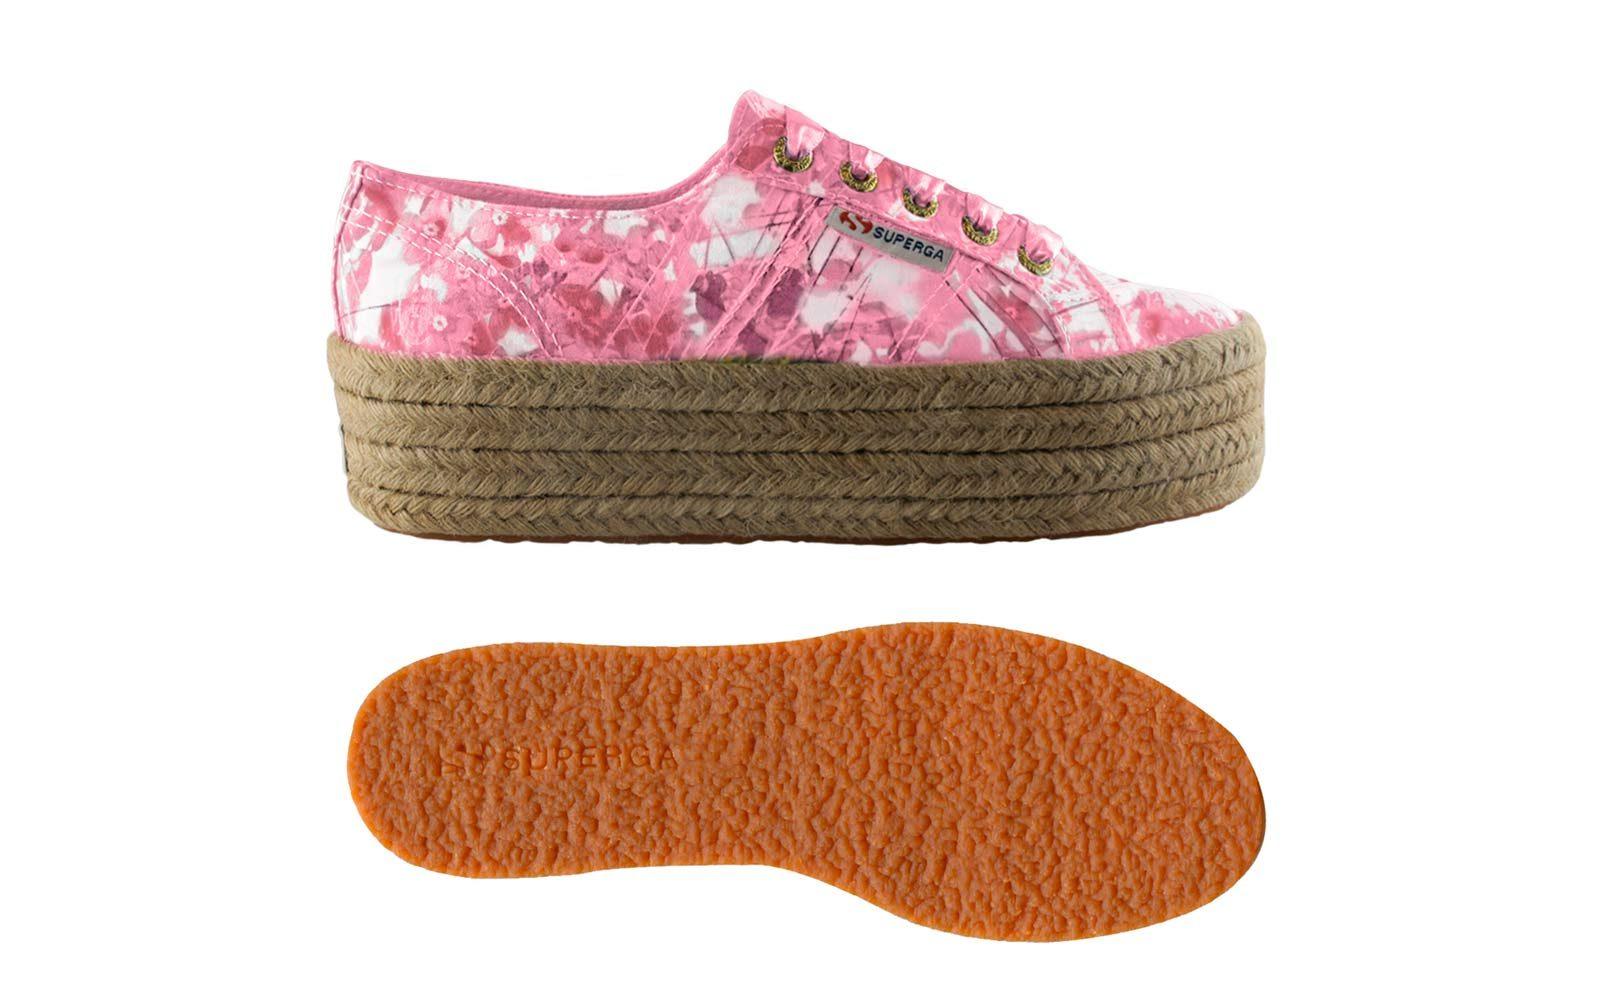 Superga – scarpe con zeppa e corda e con tomaia in tessuto (euro 85)